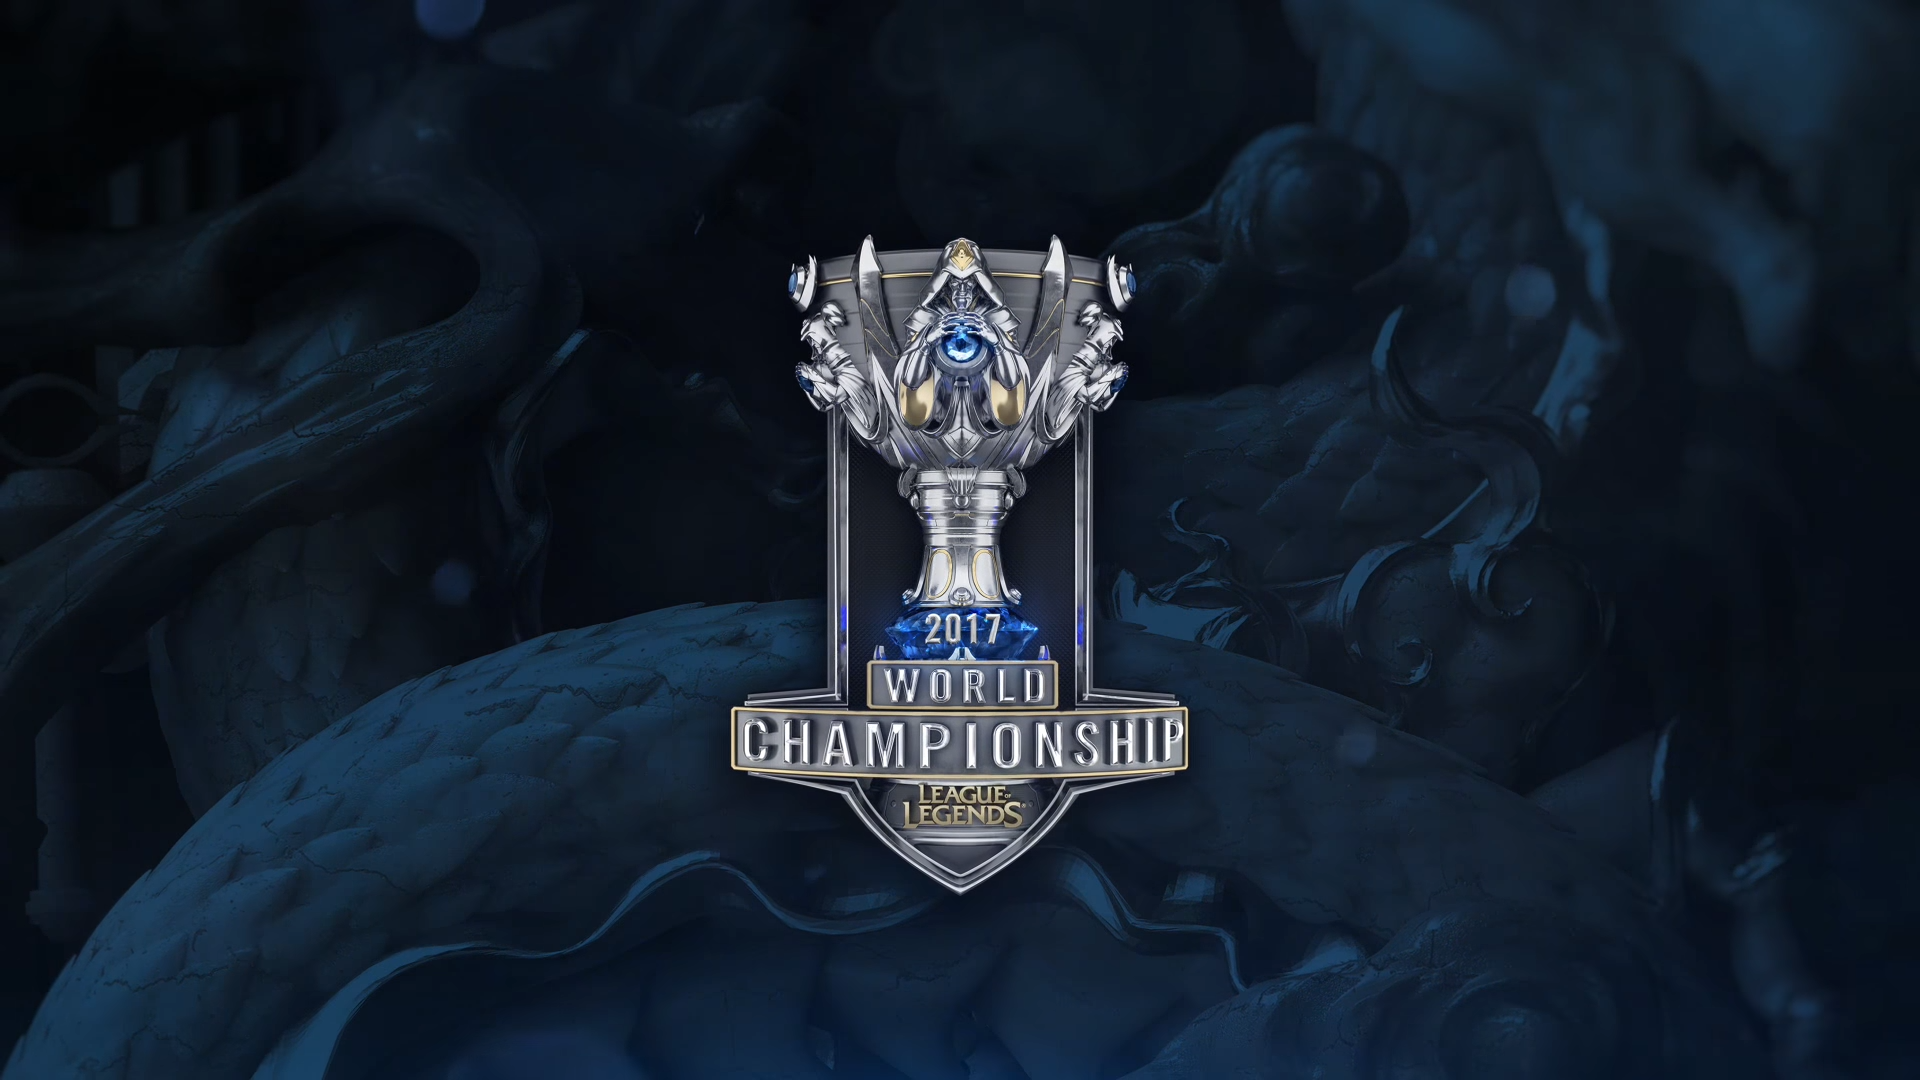 League Of Legends World Championship 2017 Hd Wallpaper